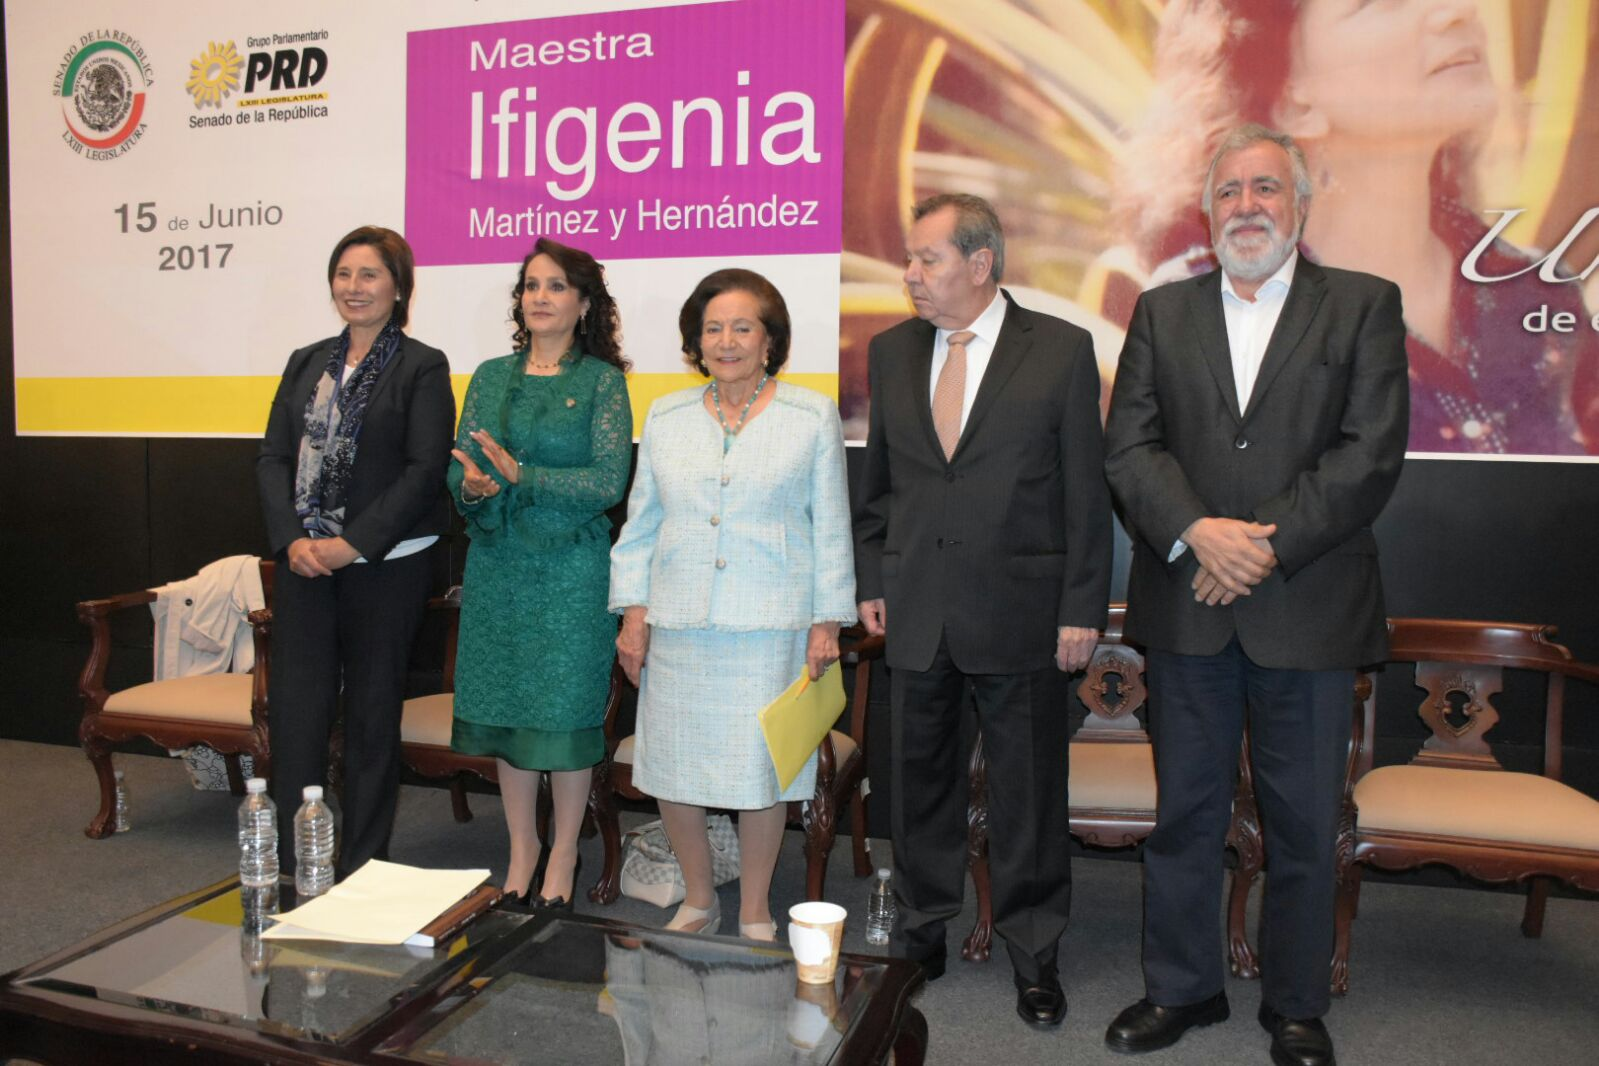 Homenaje a la Maestra Ifigenia Martínez y Hernández.